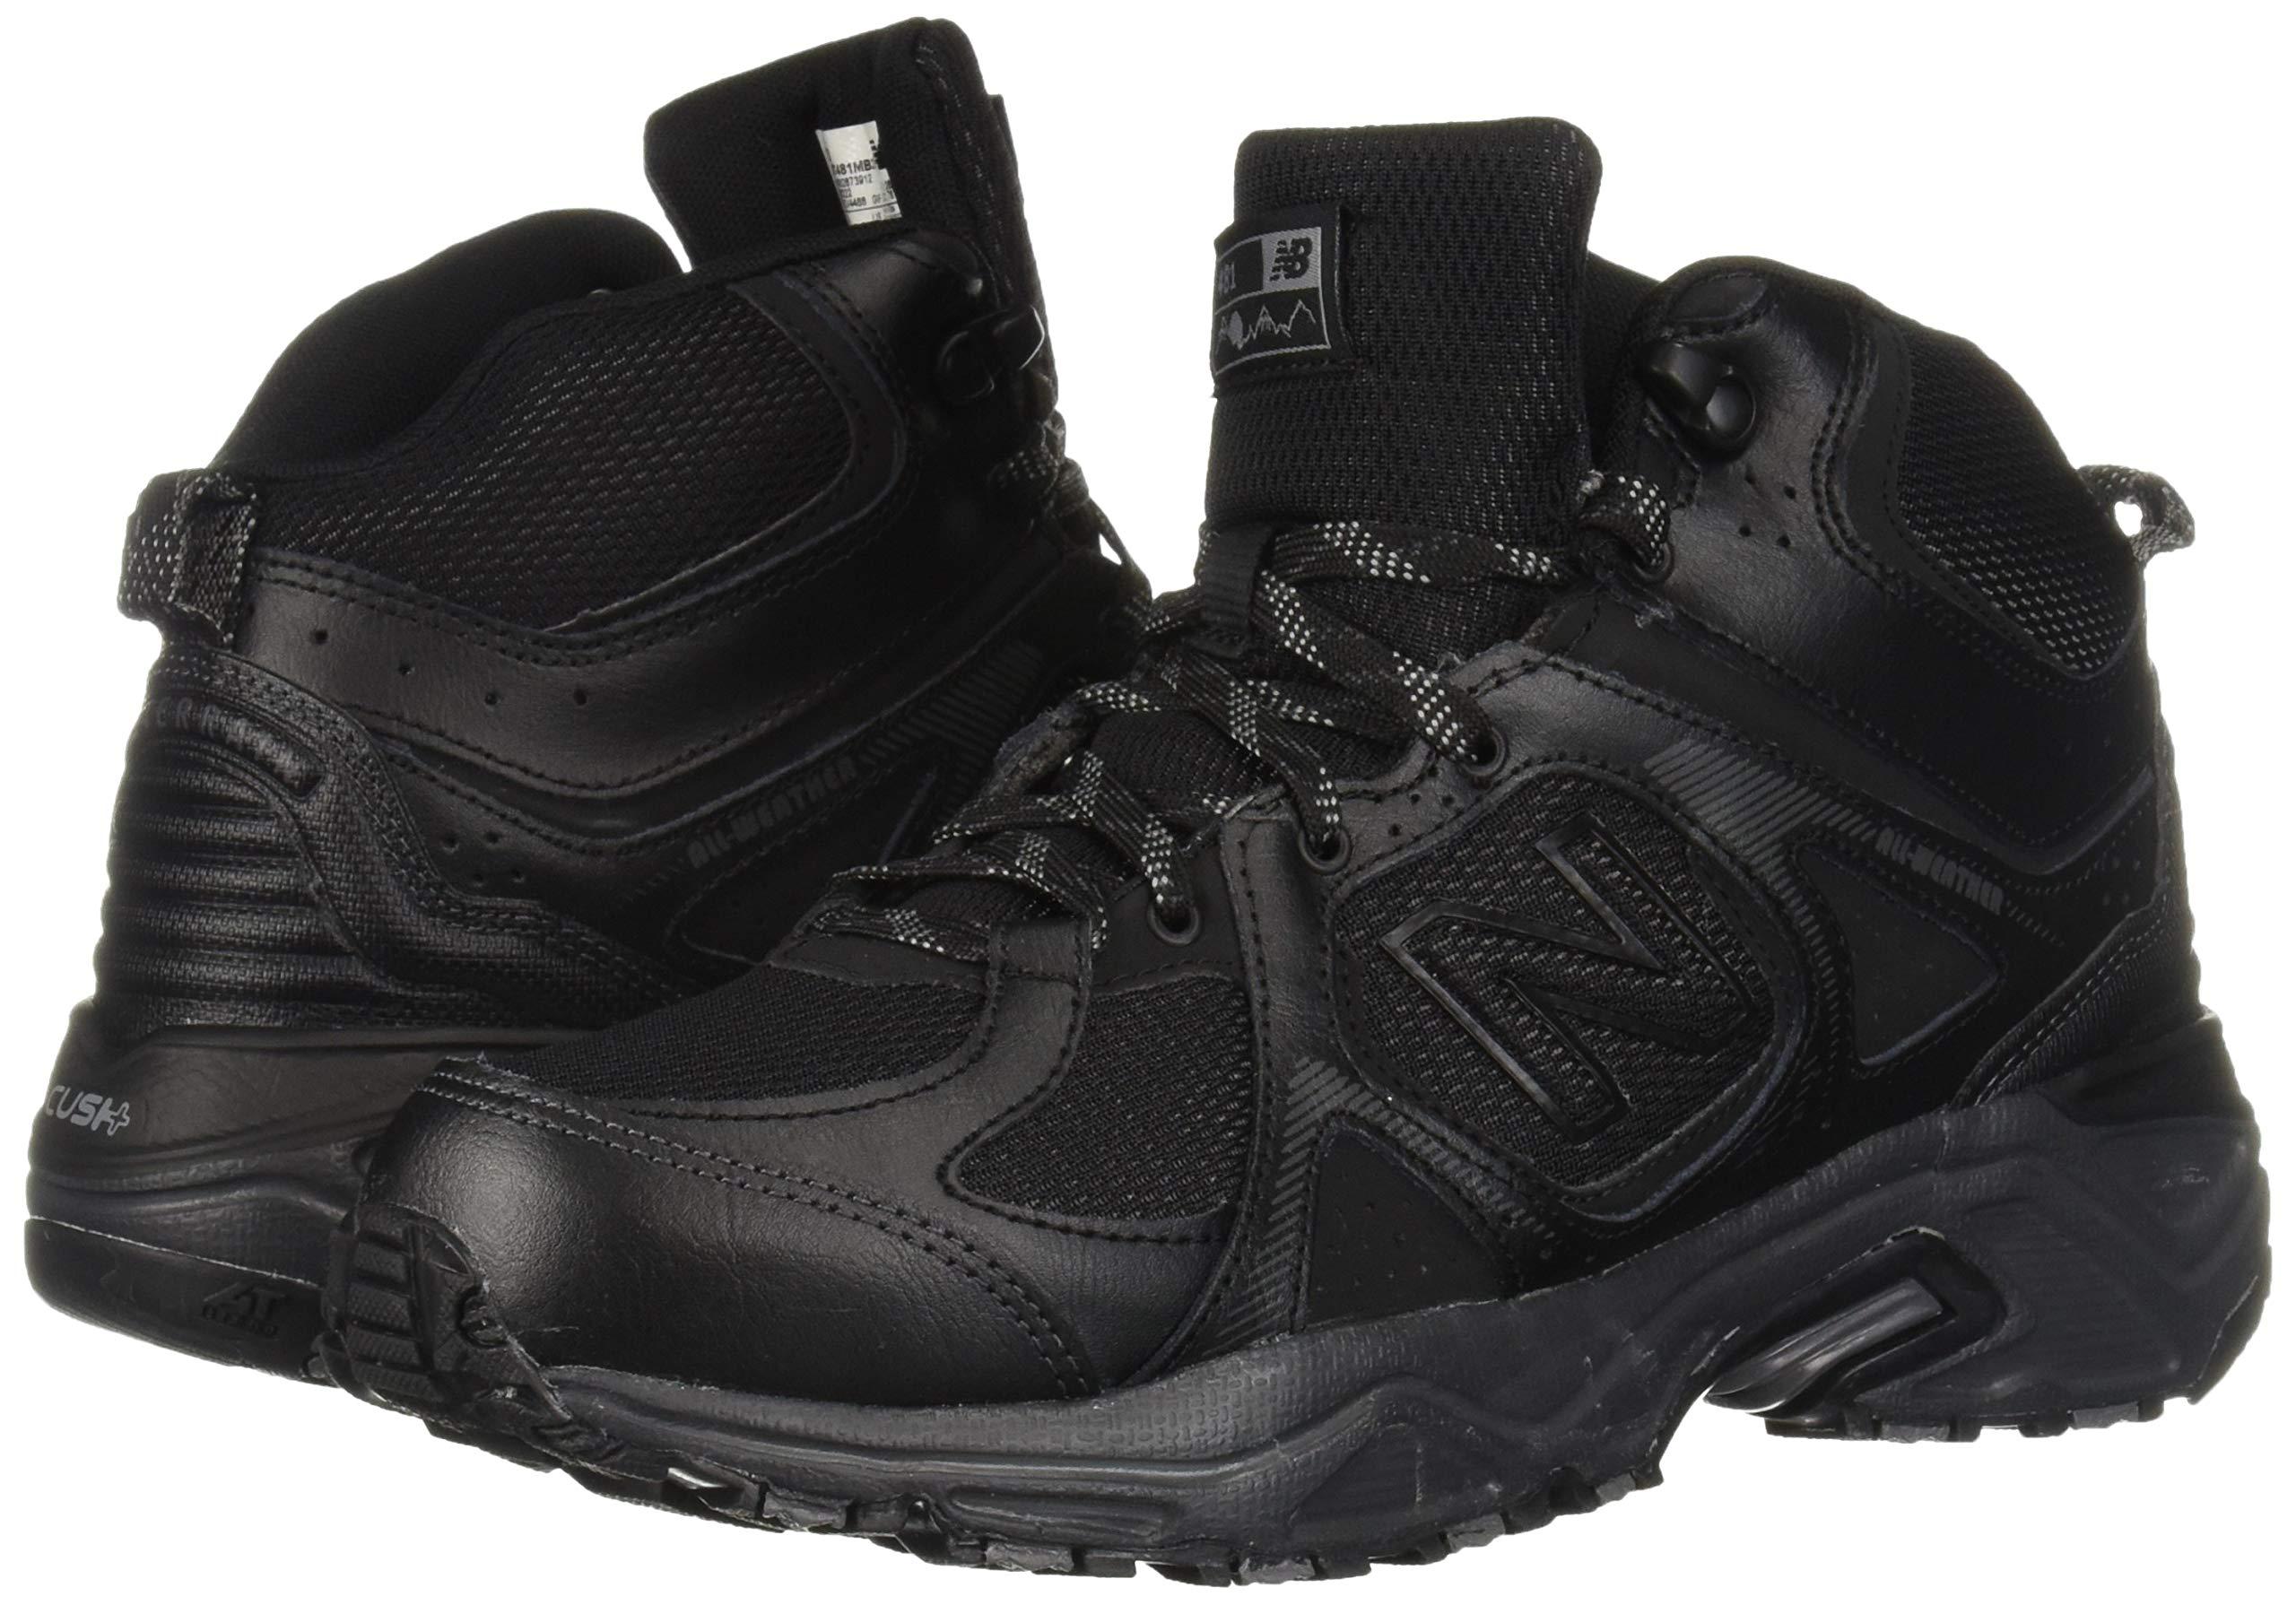 New Balance Men's 481 V3 Cushioning Trail Running Shoe Black/Magnet 9.5 D US by New Balance (Image #6)